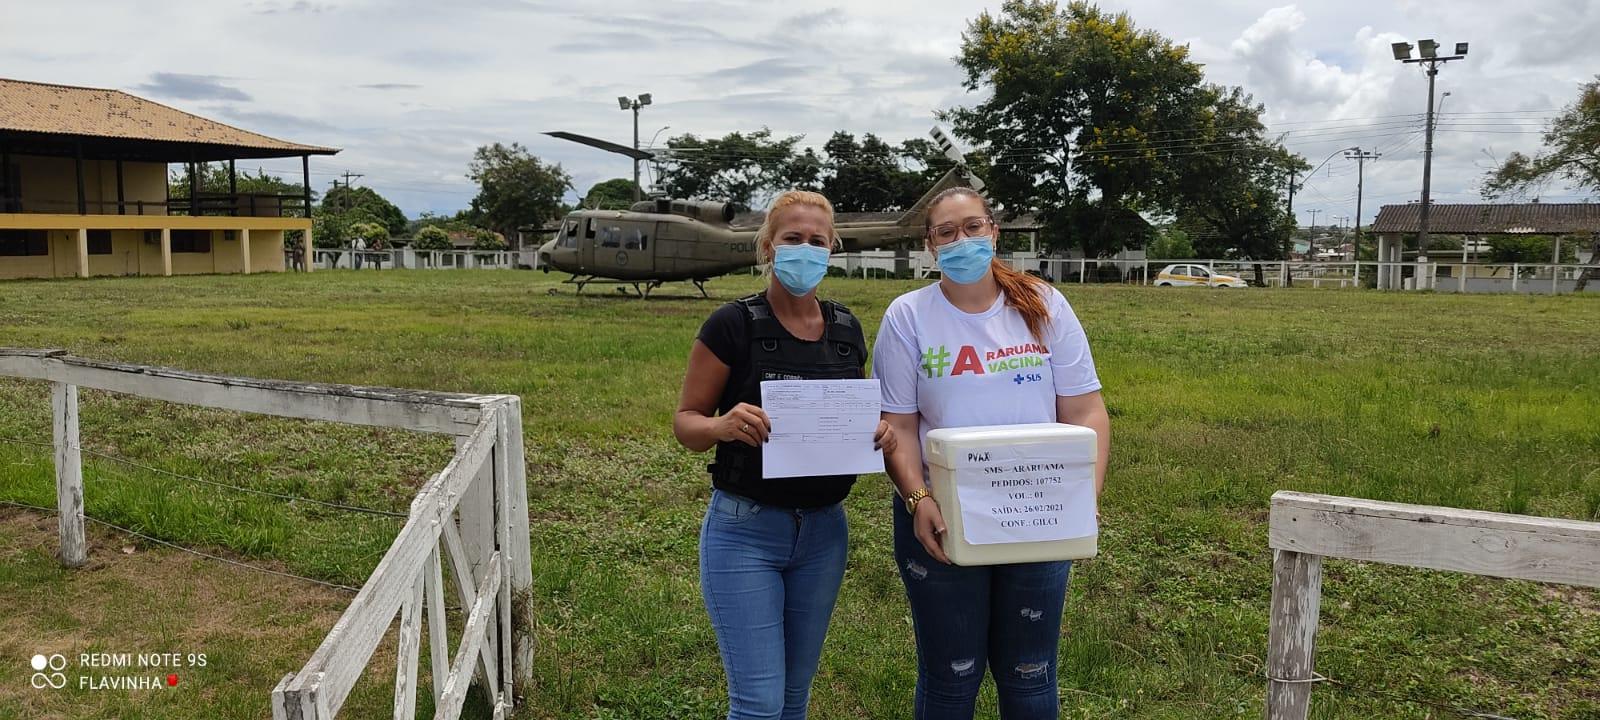 Araruama recebe novo lote de vacina contra a Covid-19 nessa segunda-feira